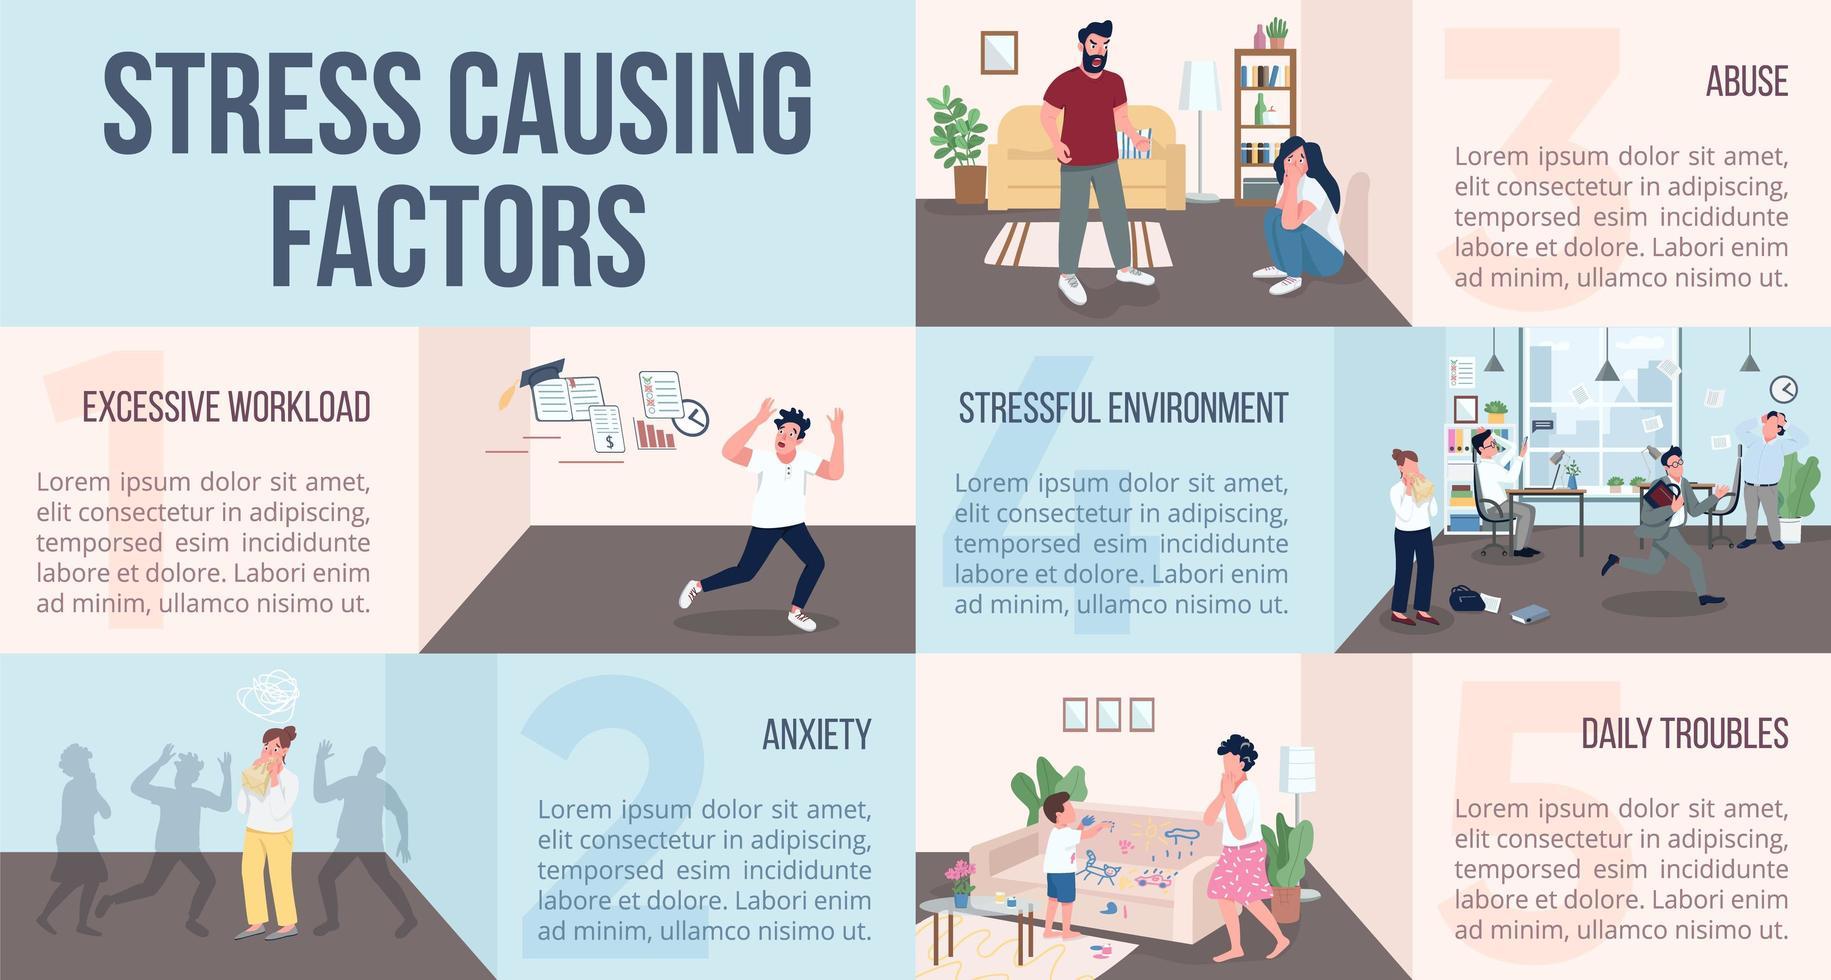 Stress verursachende Faktoren Infografik vektor